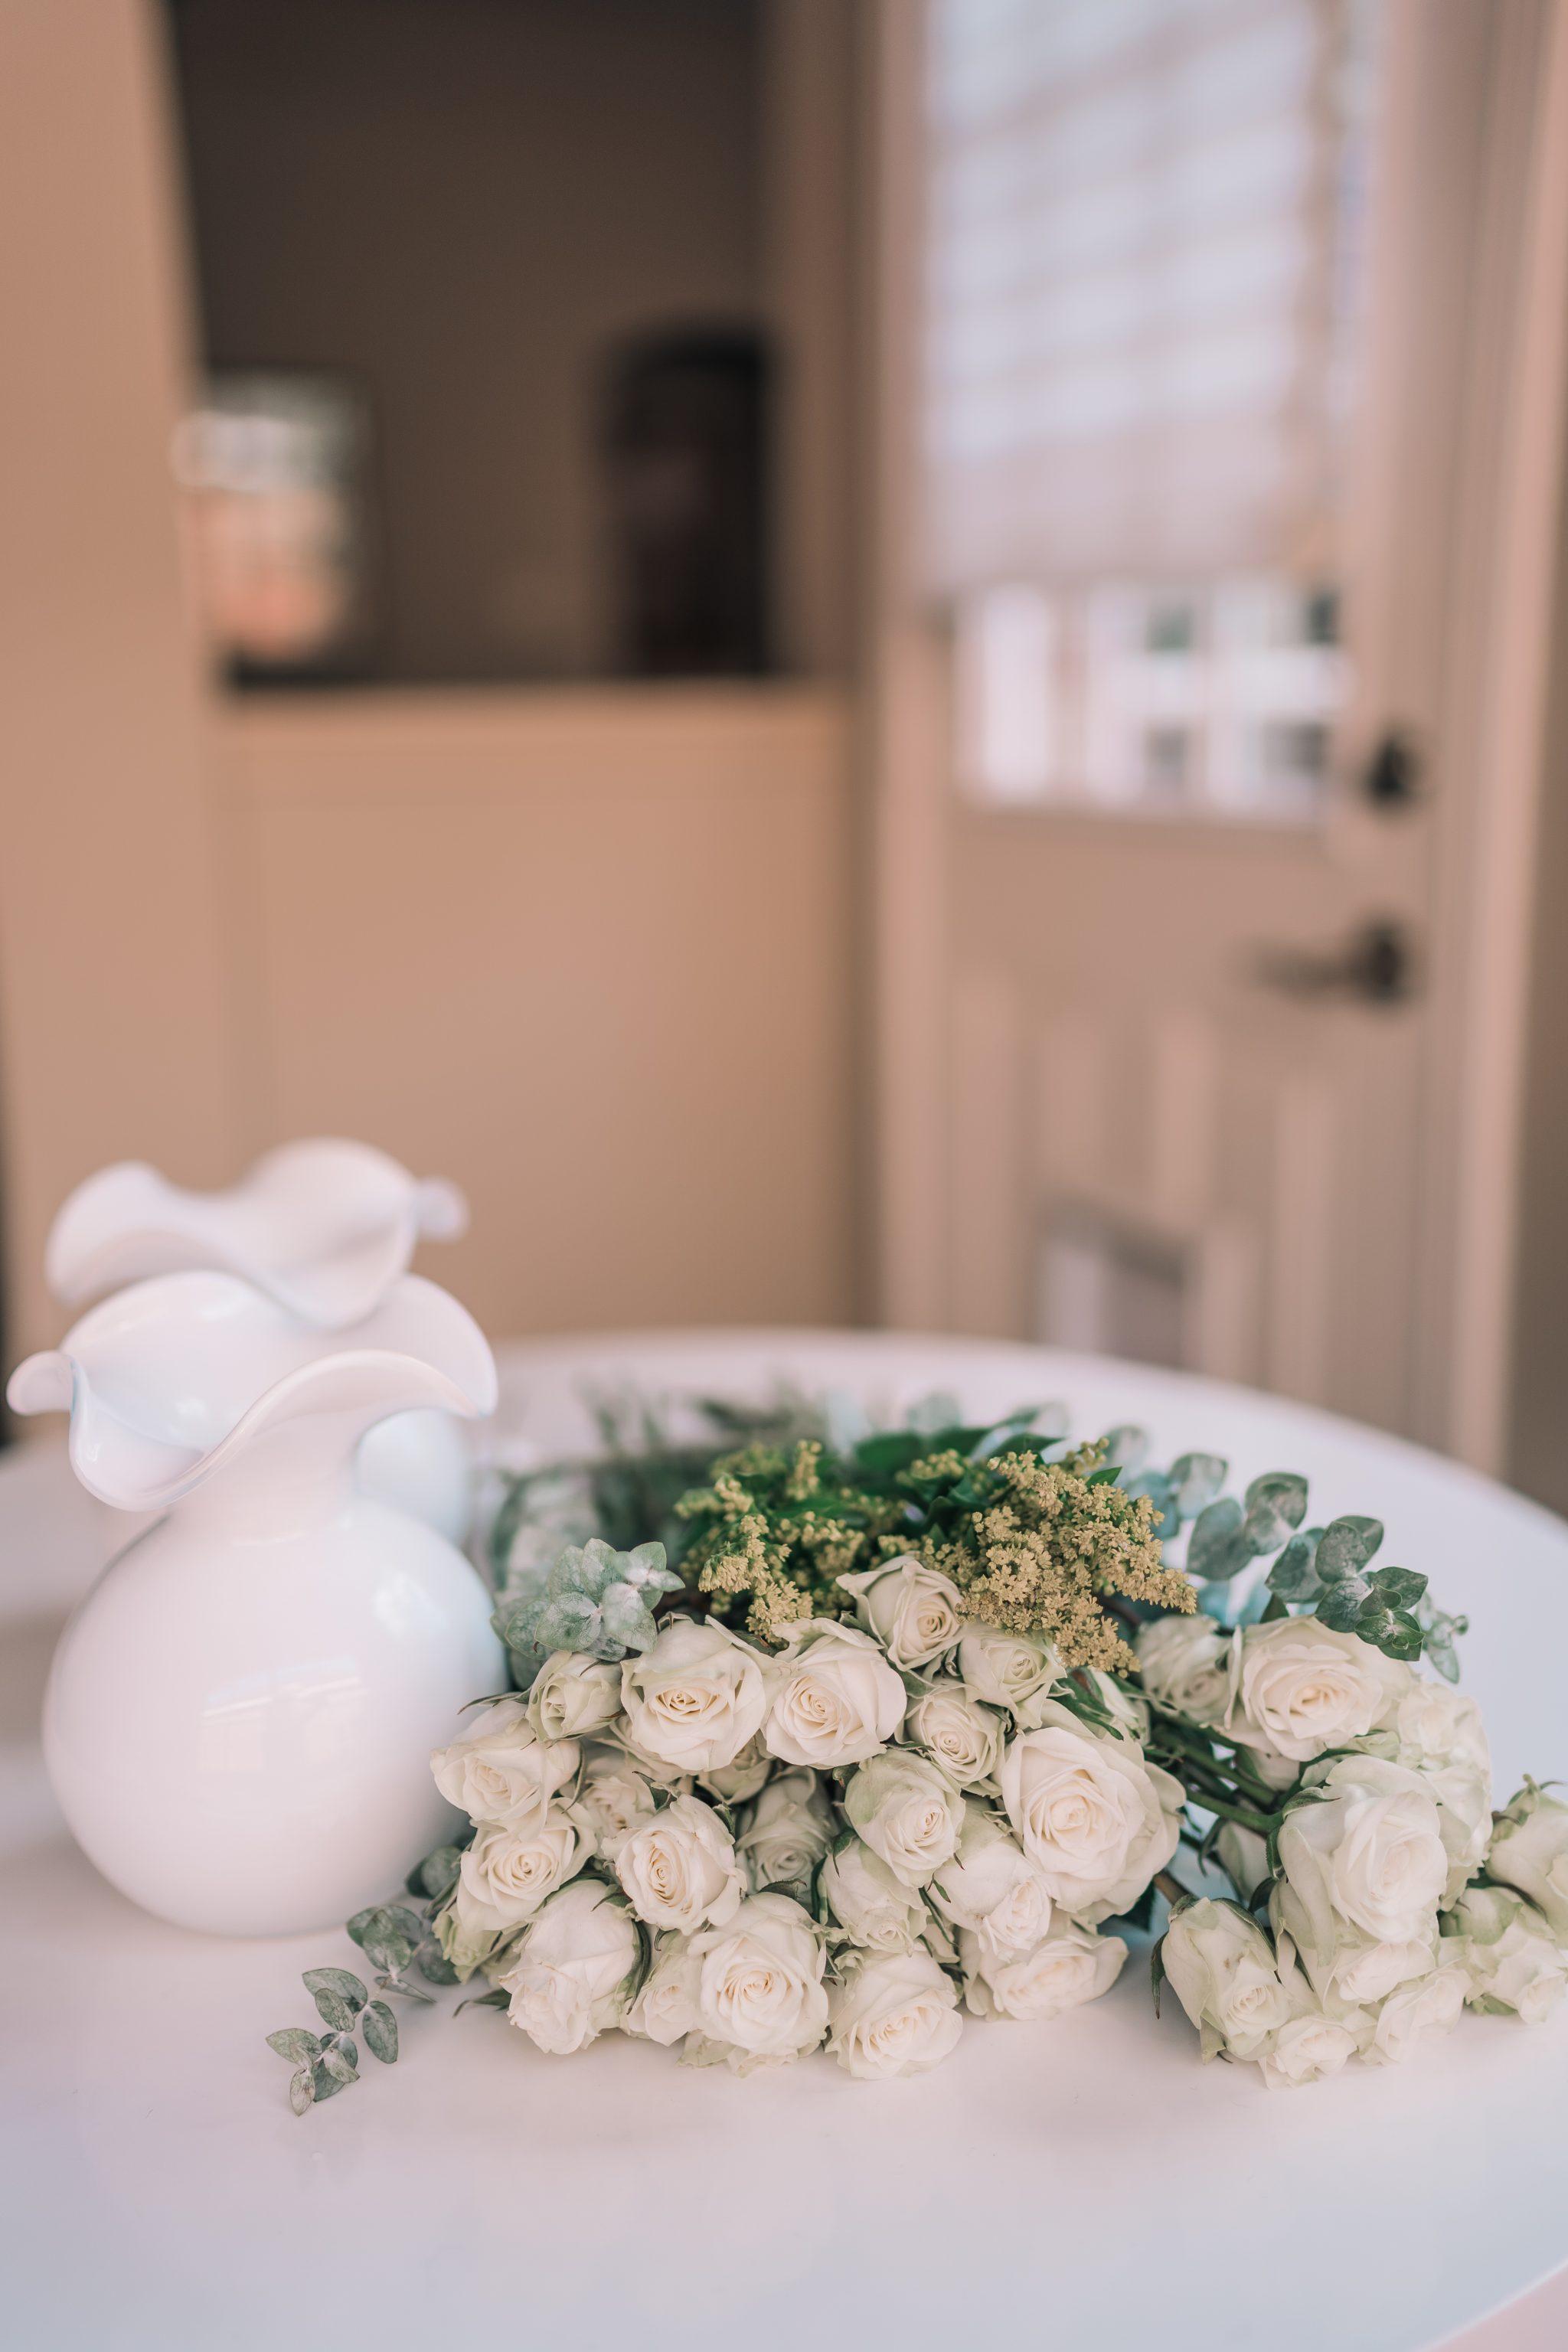 At-home DIY flower arrangements on a budget